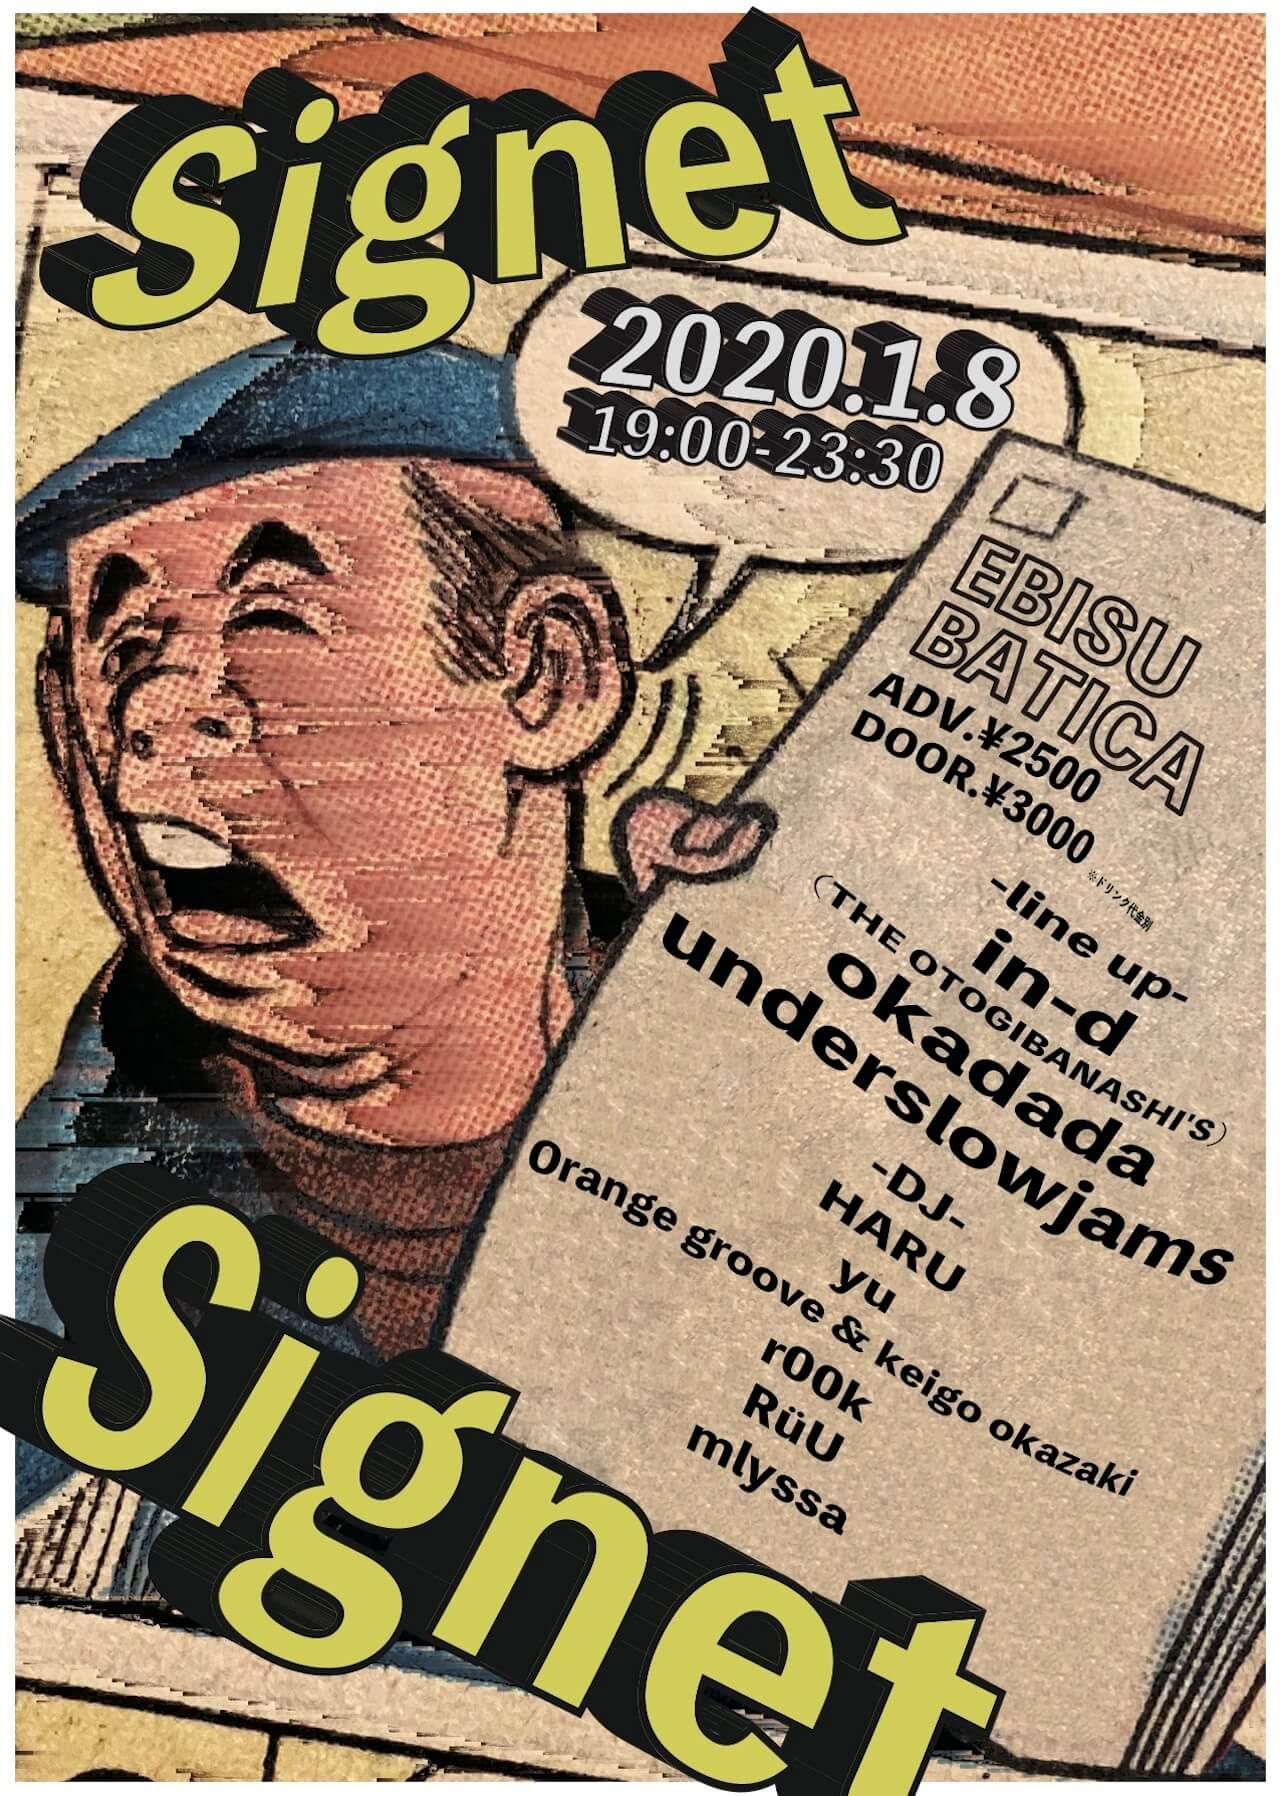 in-d、okadada、underslowjamsらが出演する<Signet>が恵比寿BATICAで2020年1月8日に開催 music191216-signet